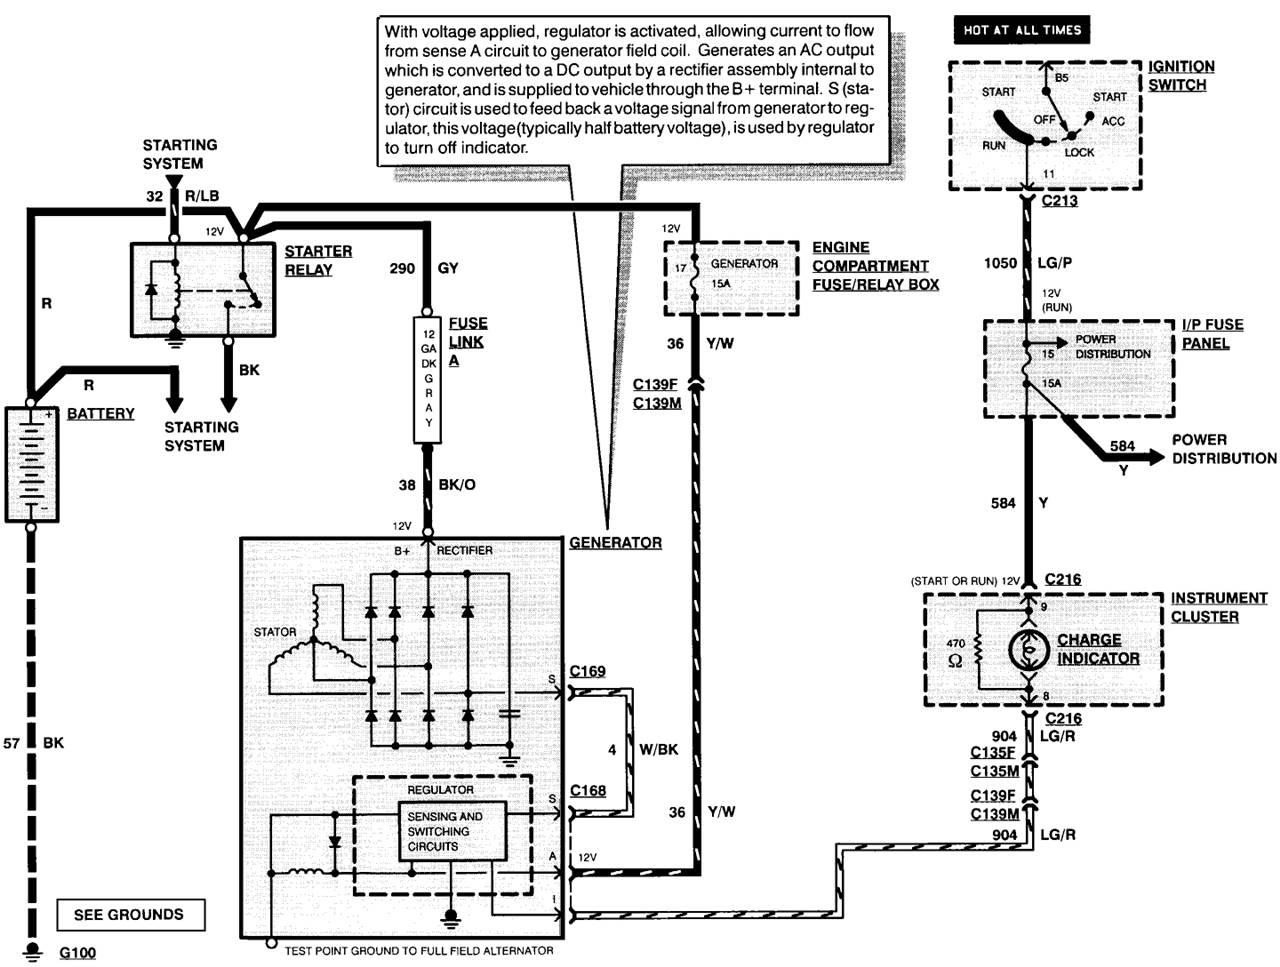 Ford Alternator Wiring Diagram No Regulator | Manual E-Books - Ford Alternator Wiring Diagram